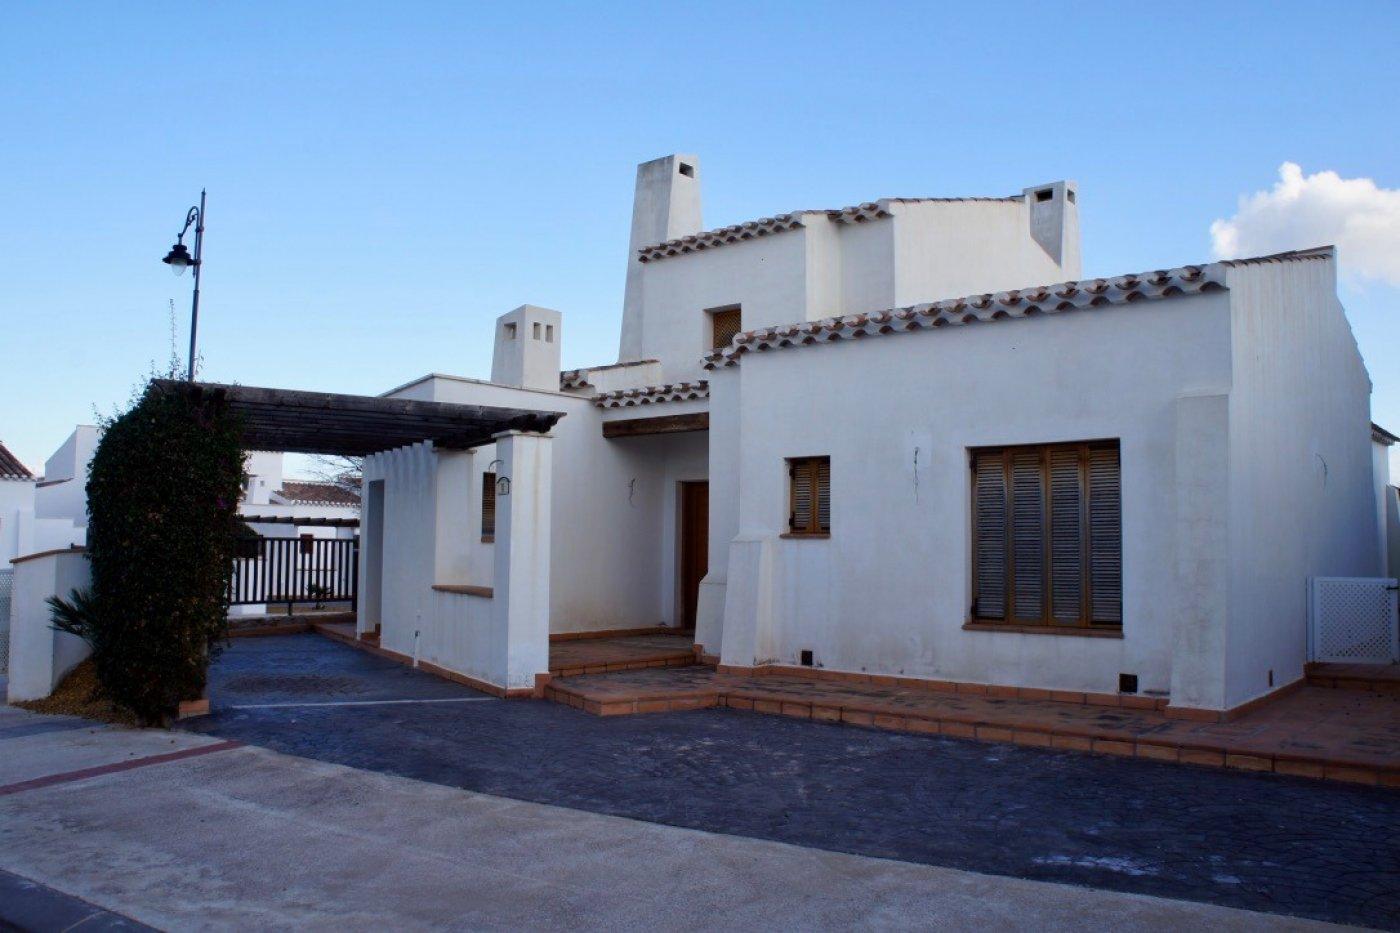 Gallery Image 5 of Fantastic offer - bank repossessed south facing villa on EL Valle Golf Resort